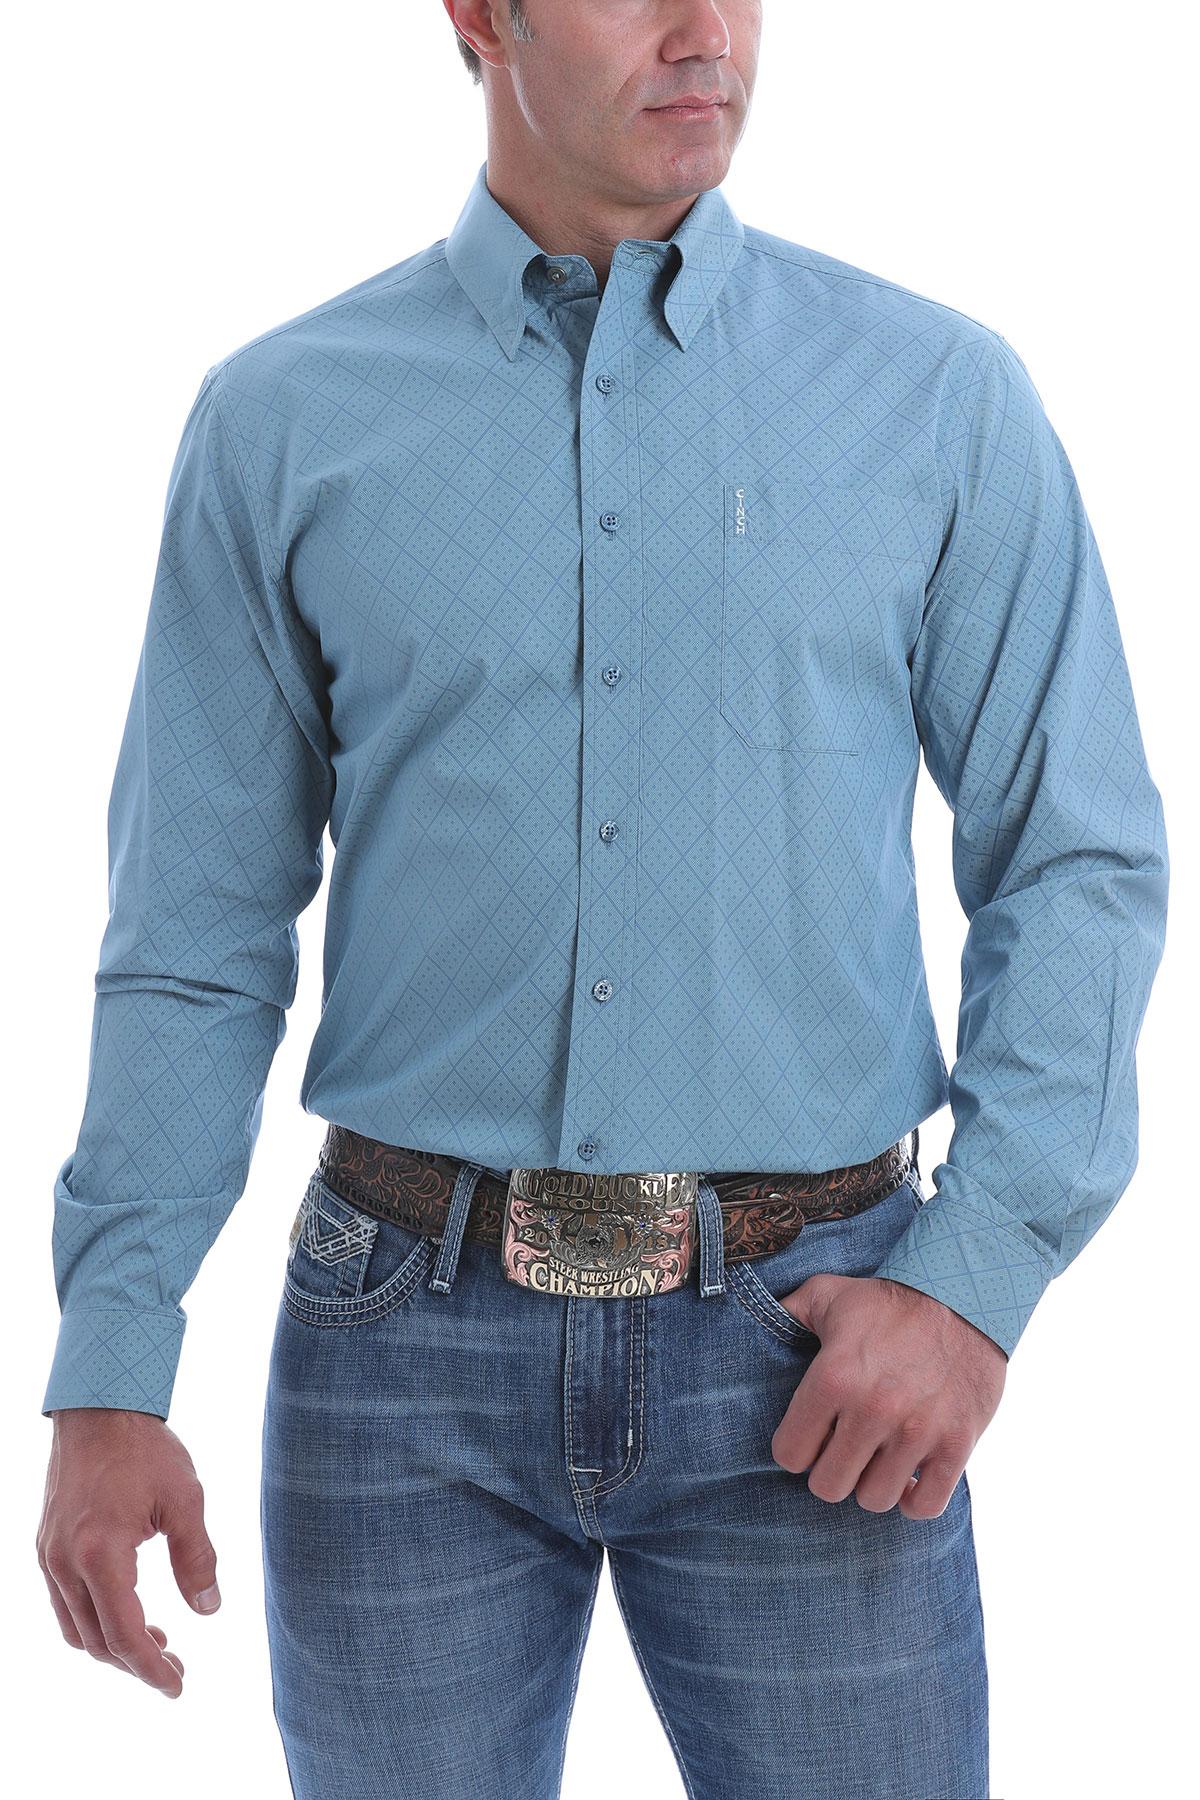 chemise-equitation-western-homme-cinch-bleu-ciel(4)